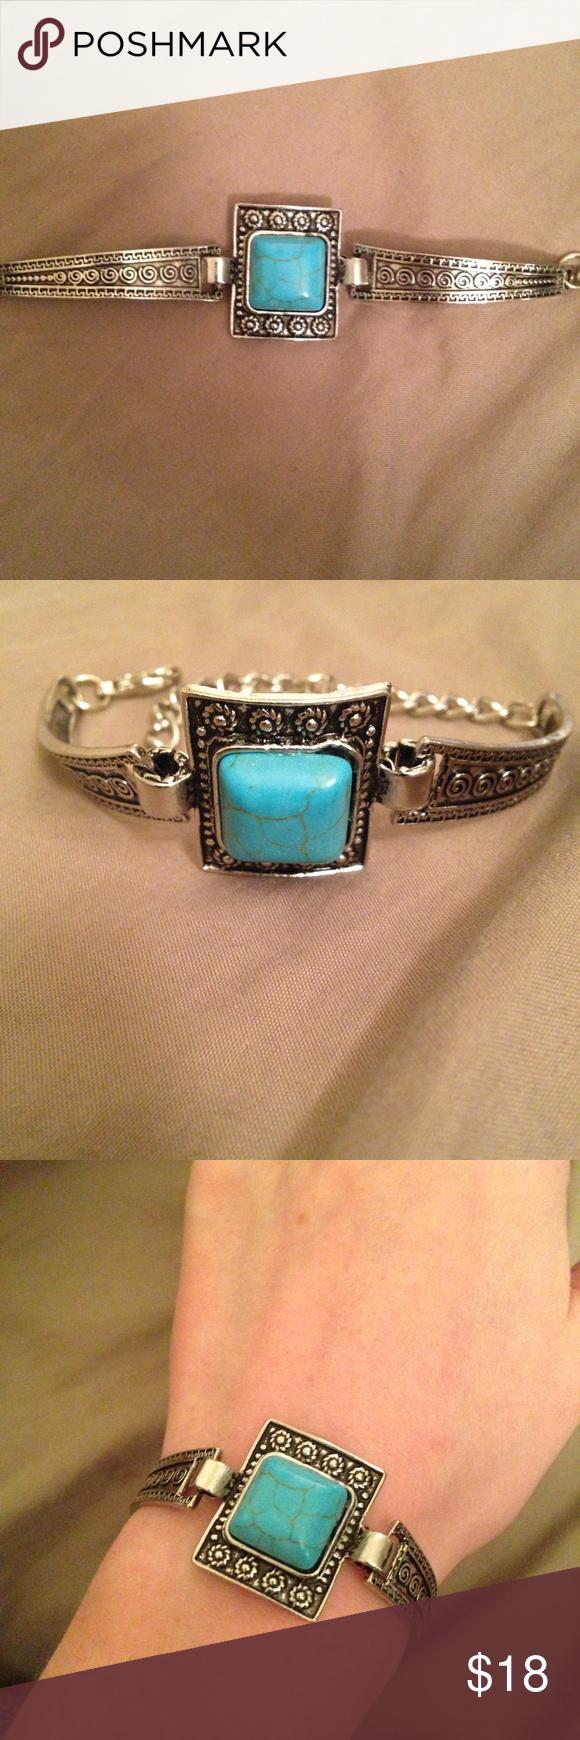 Beautiful square bracelet w engraved silver turquoise bracelet